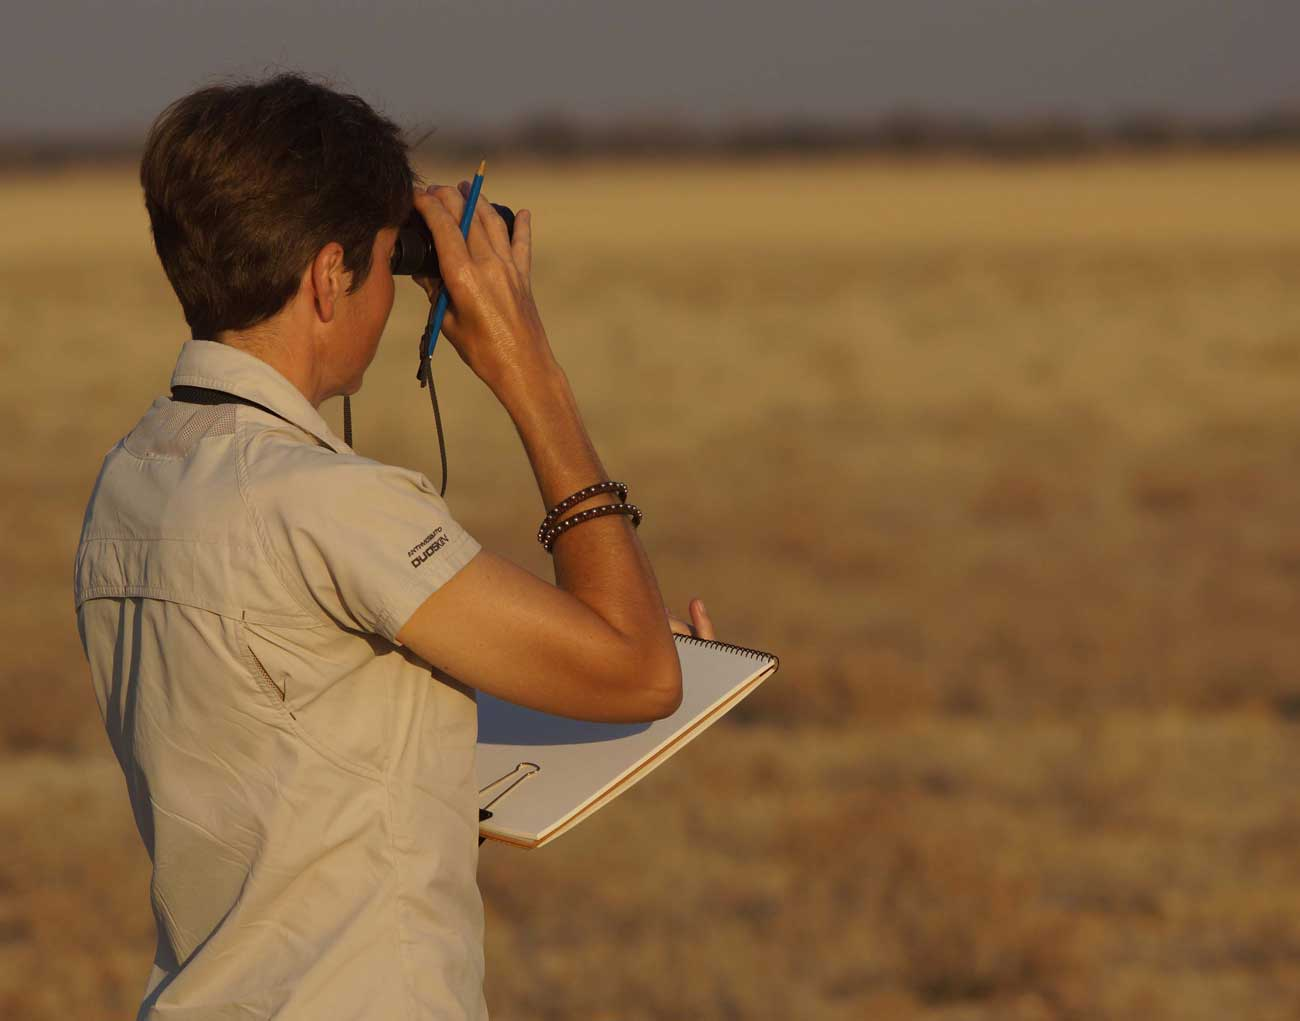 Alison Nicholls sketching in Botswana